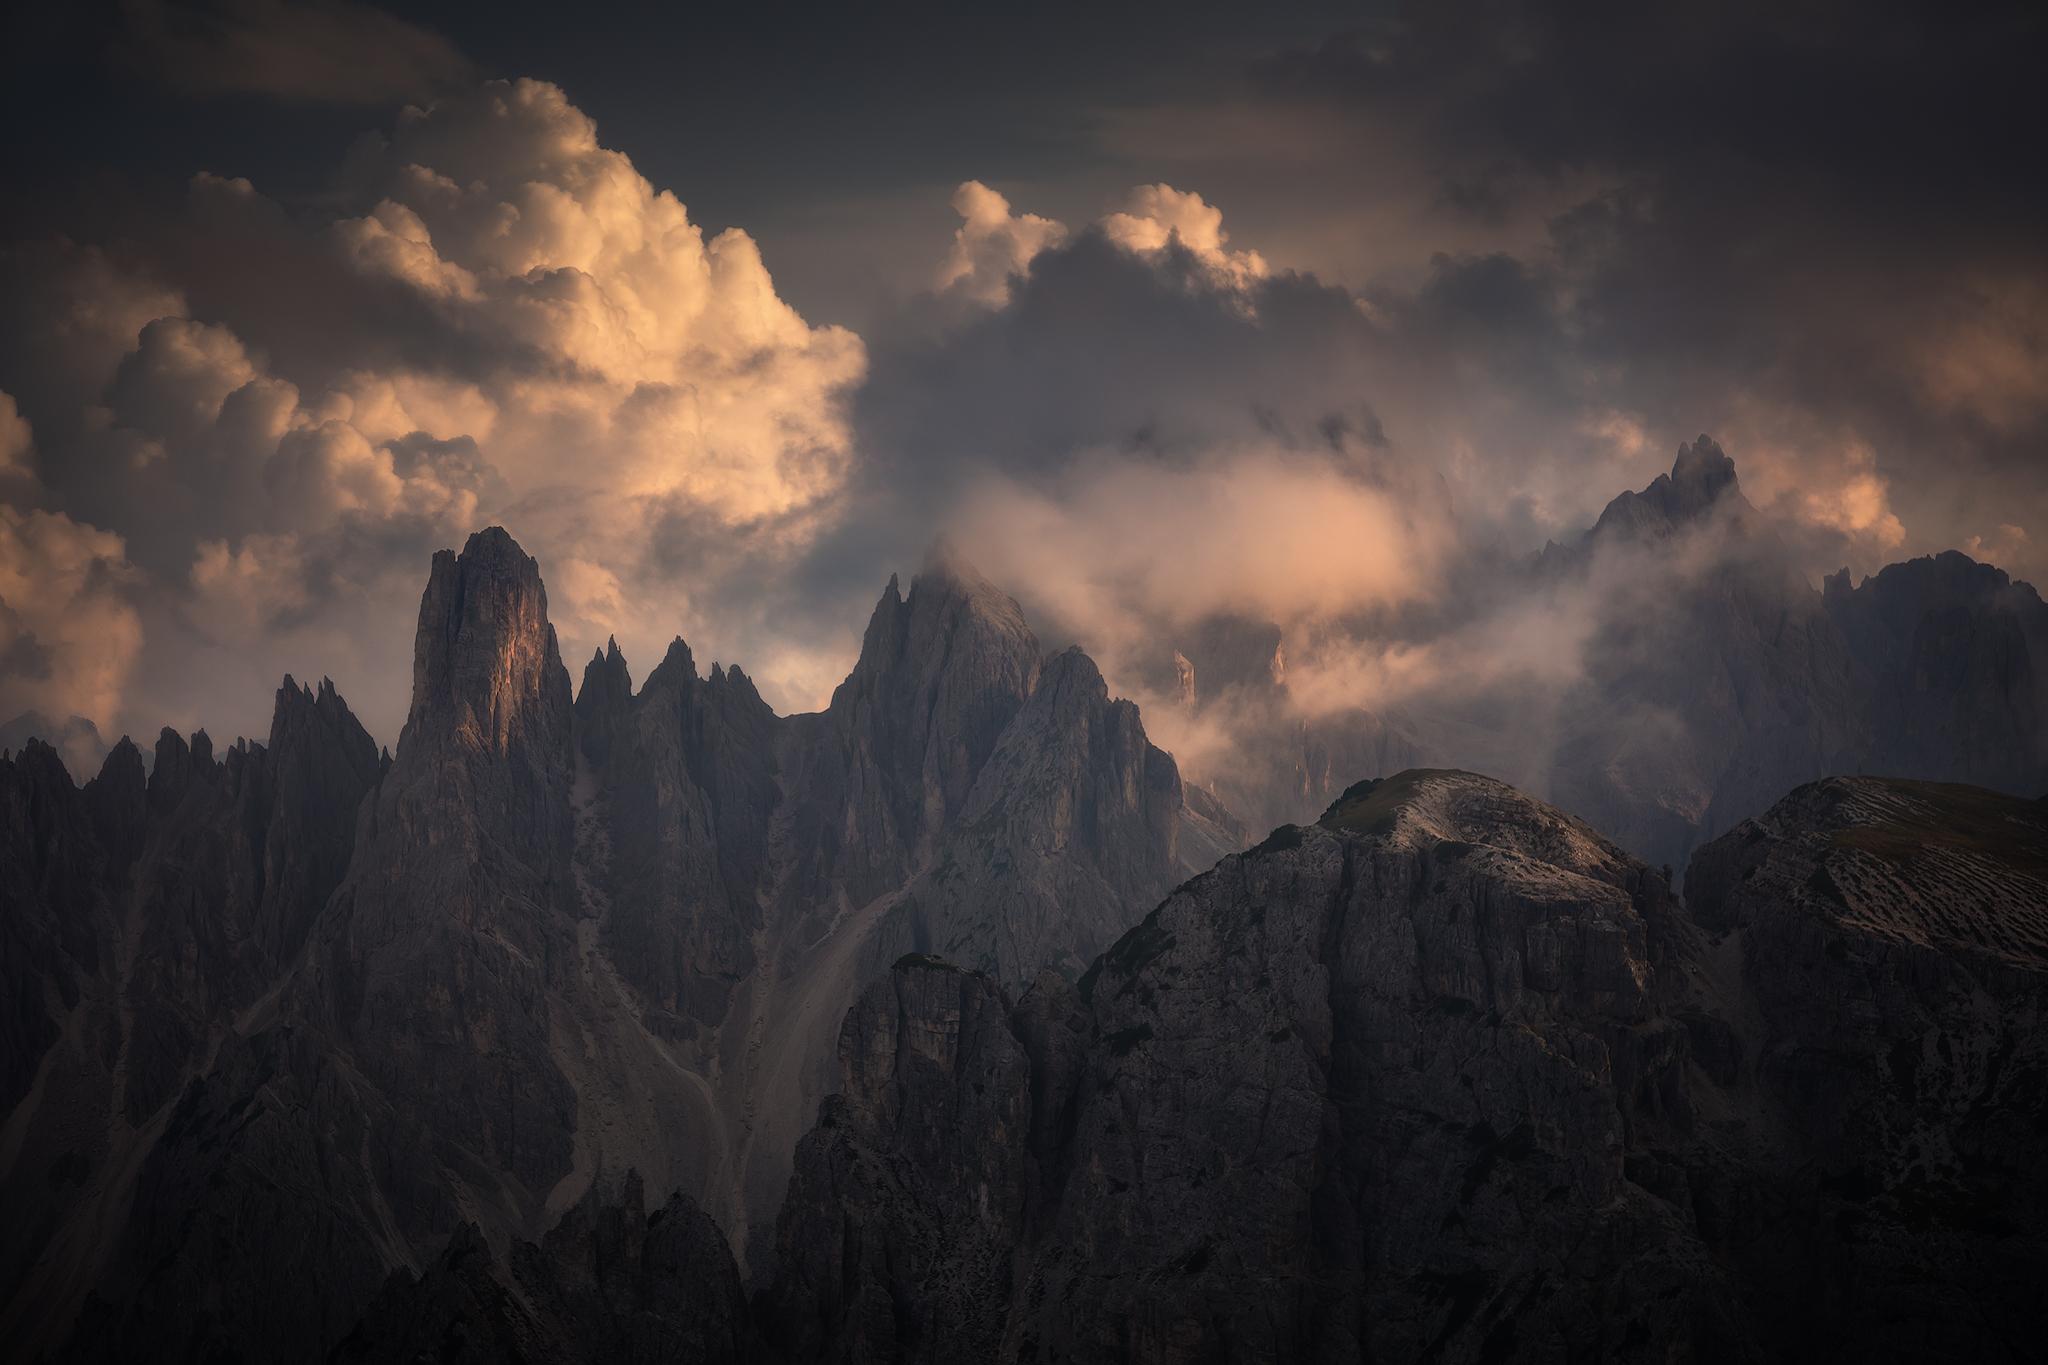 landscape dramatic editing tutorial photoshop copy